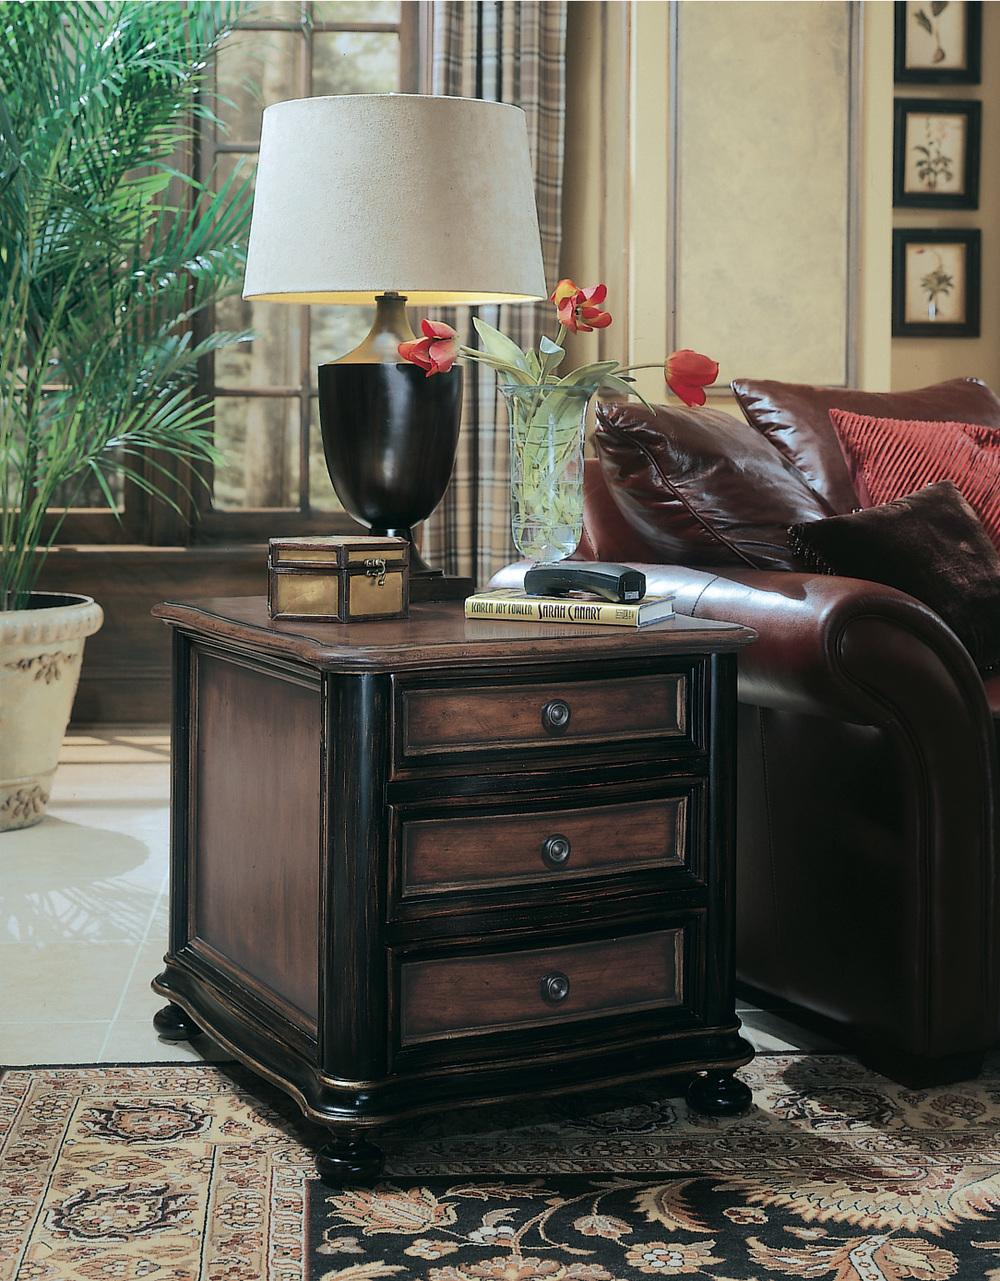 Hooker Furniture - Preston Ridge Chairside Chest